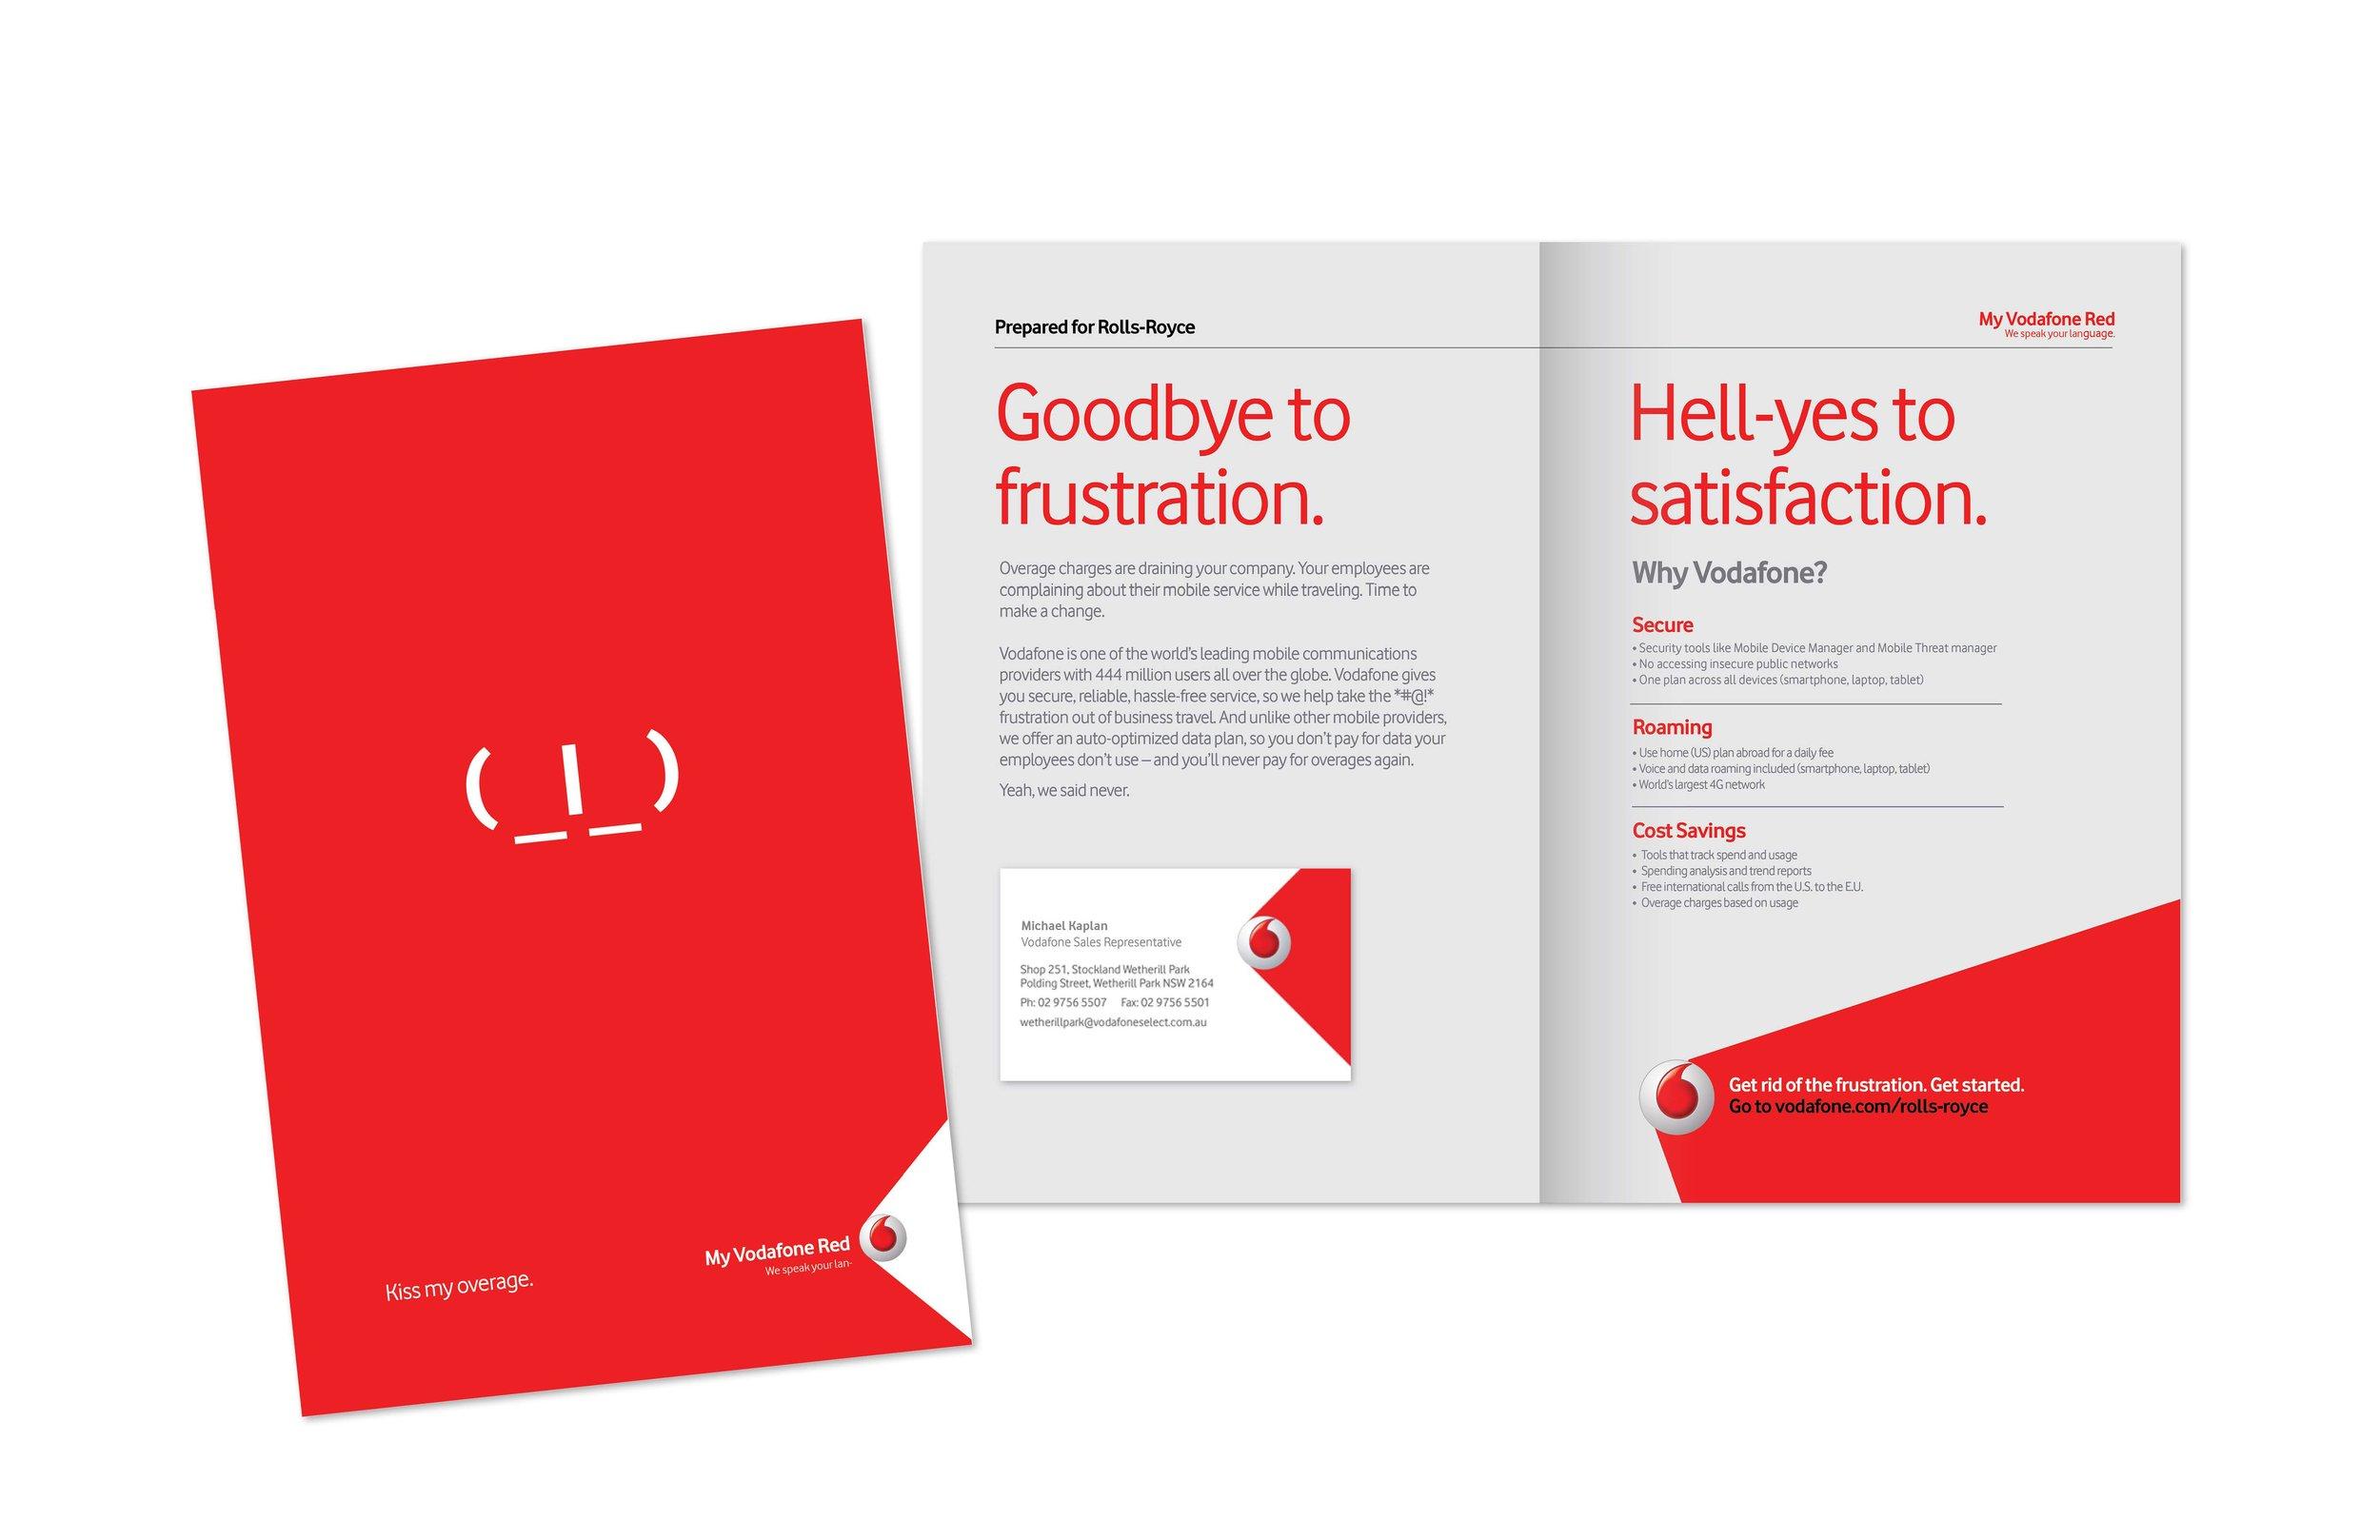 Web_Vodafone_Page_06.jpg